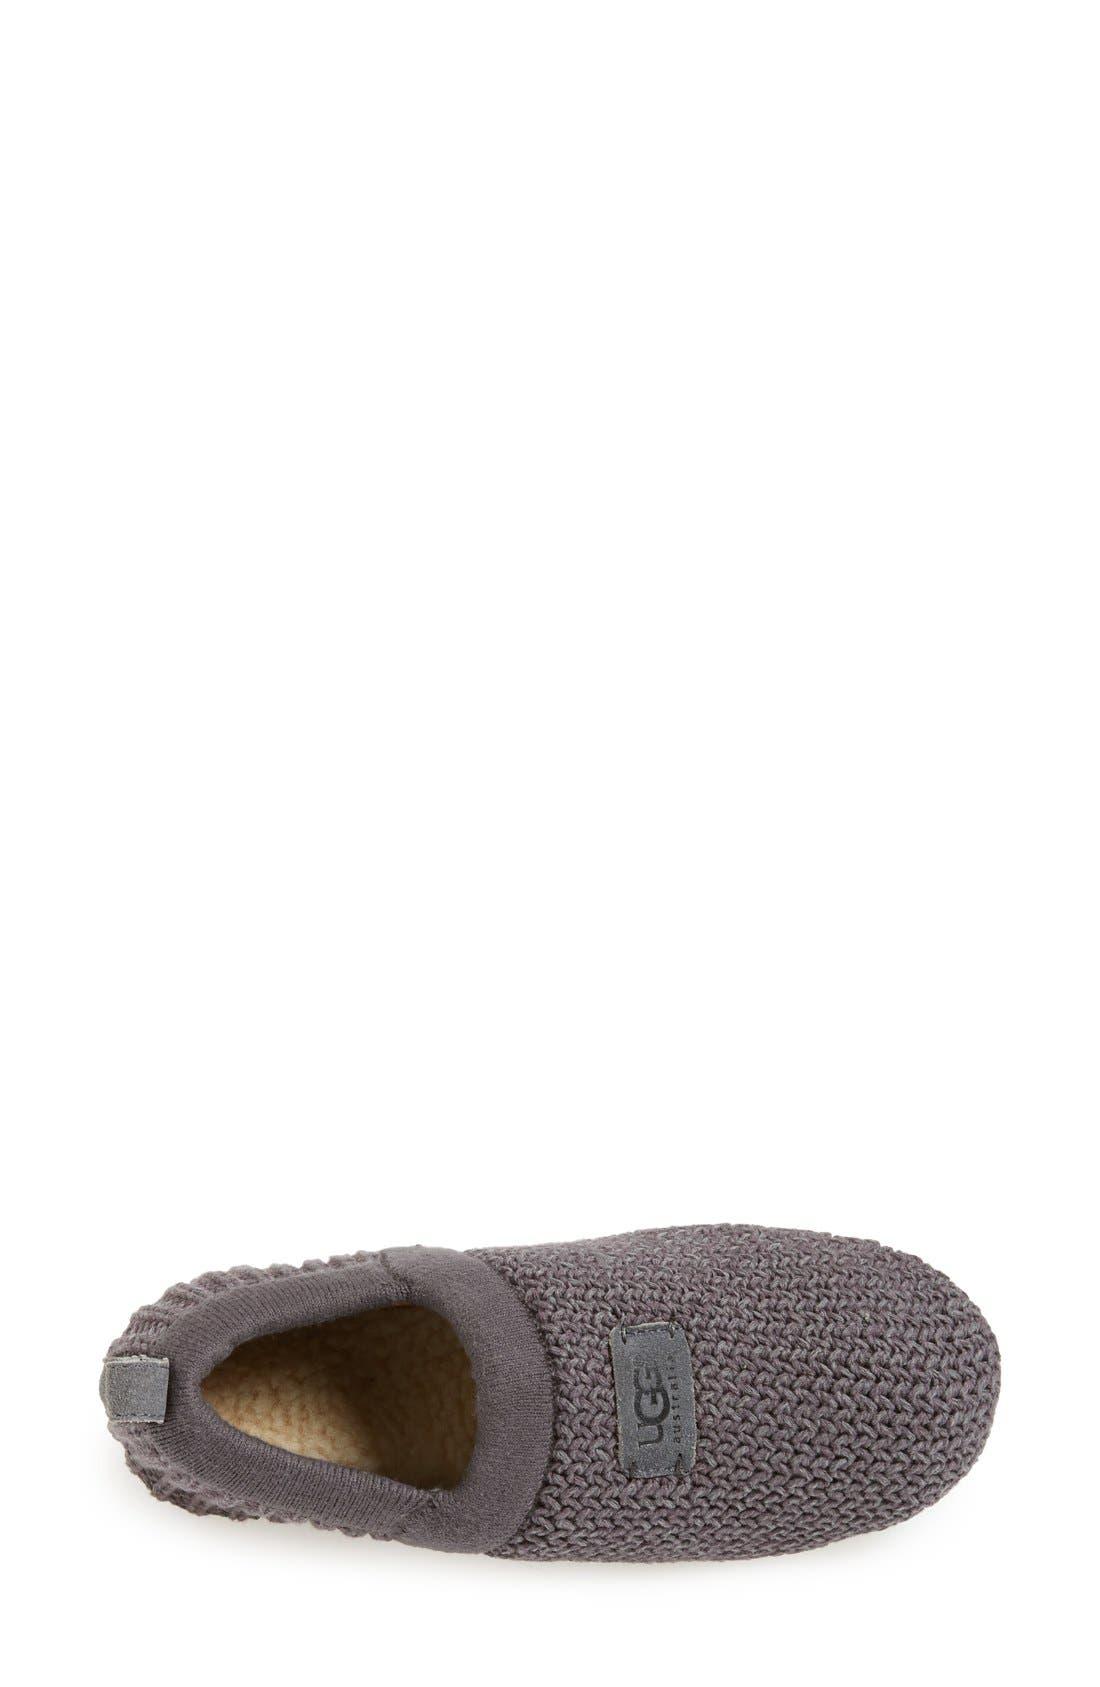 Alternate Image 3  - UGG® Australia 'Calypso' Knit Slipper